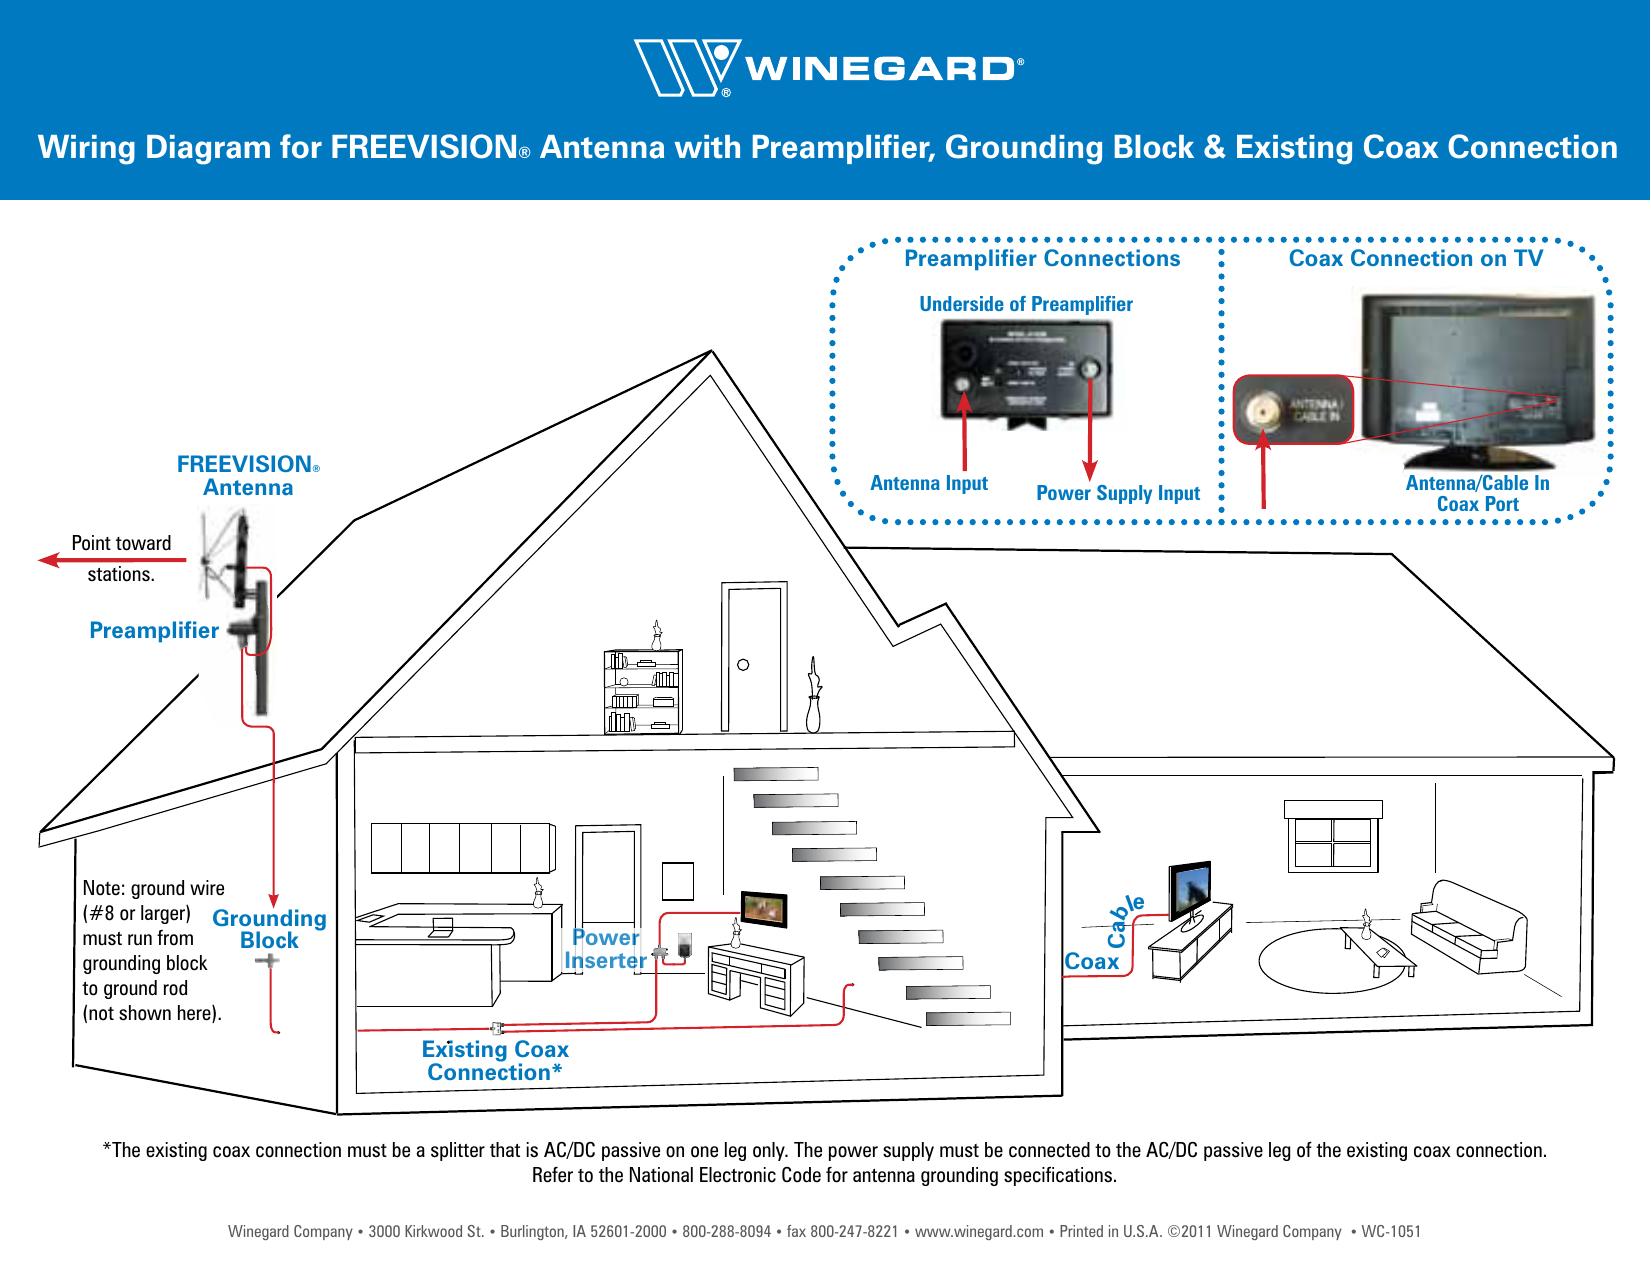 Winegard Power Supply Ap 8700 Users Manual